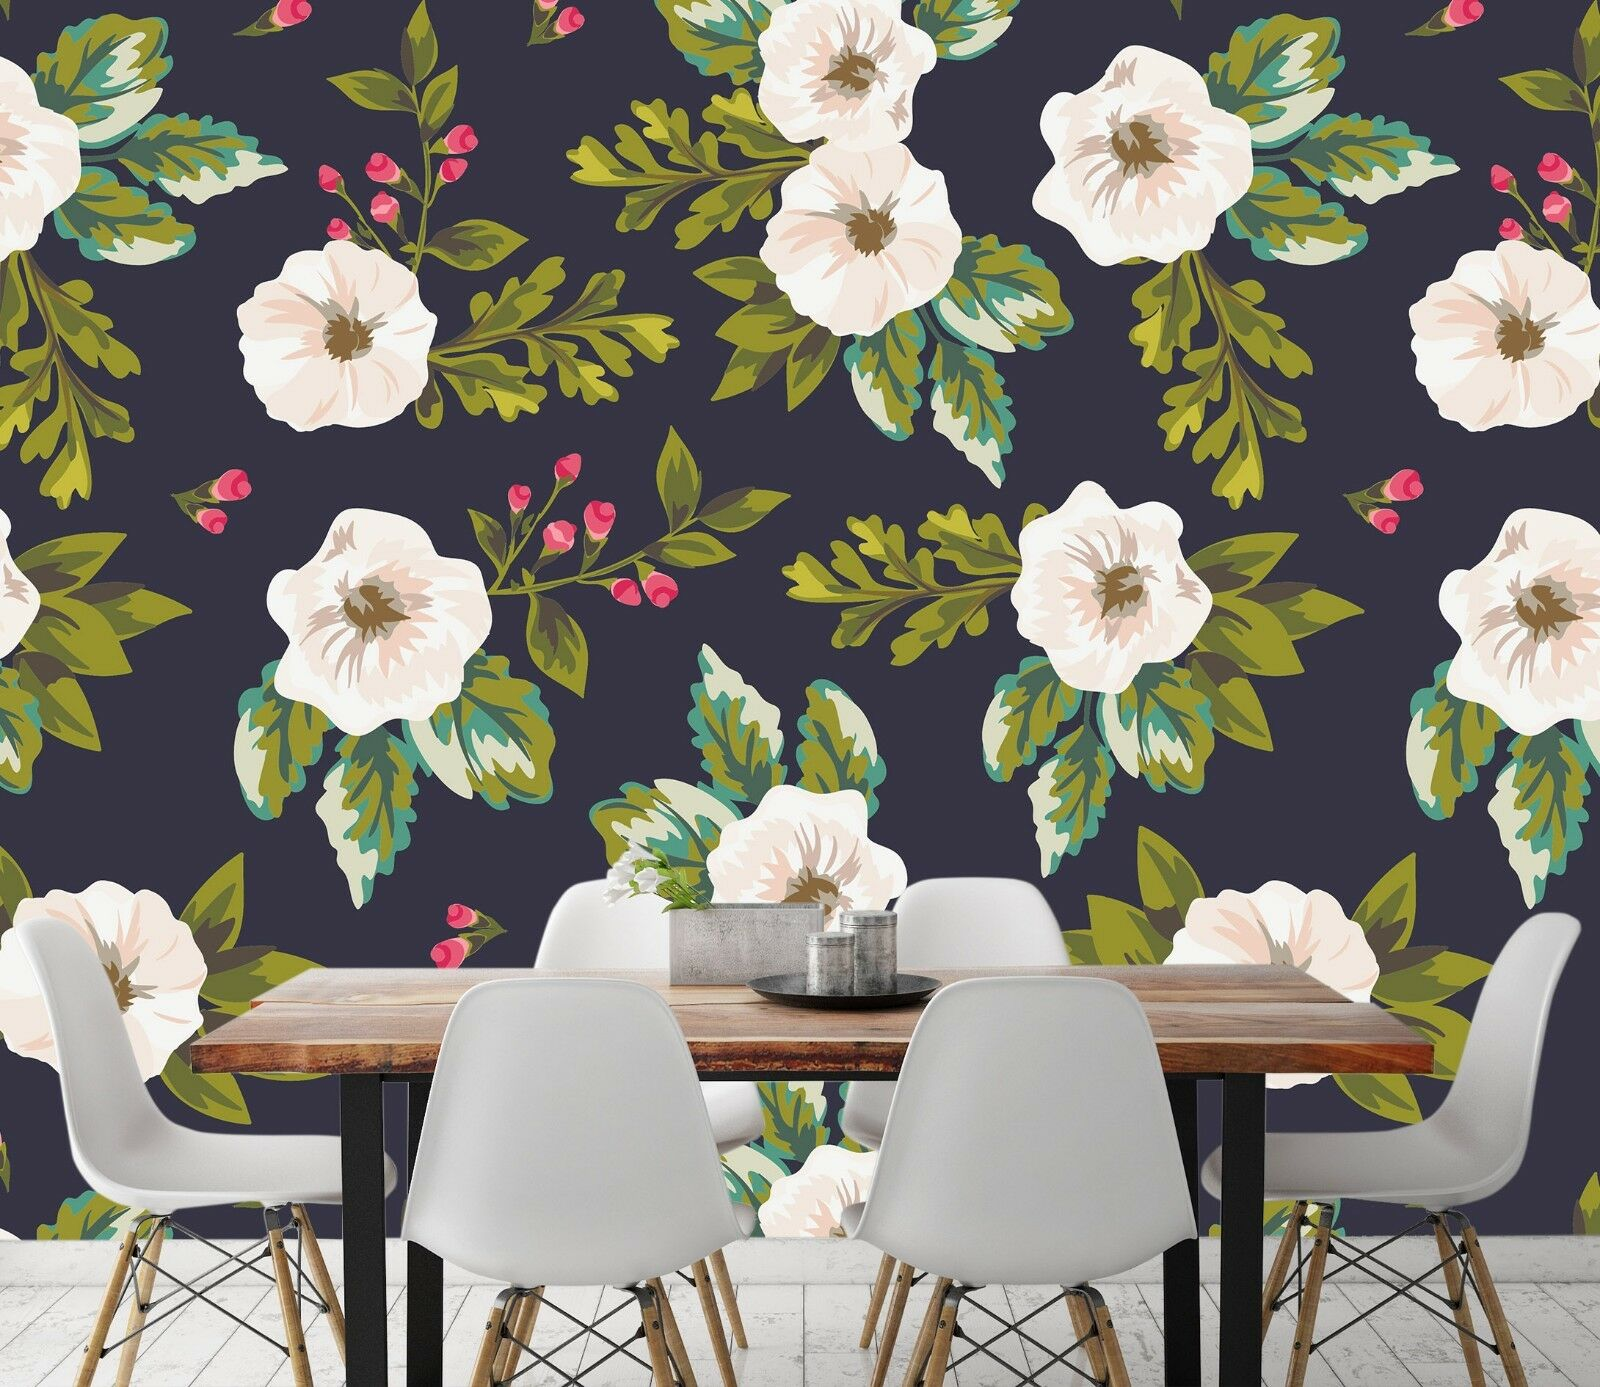 3D Flowers Painting 642 Wallpaper Murals Wall Print Wallpaper Mural AJ WALL UK